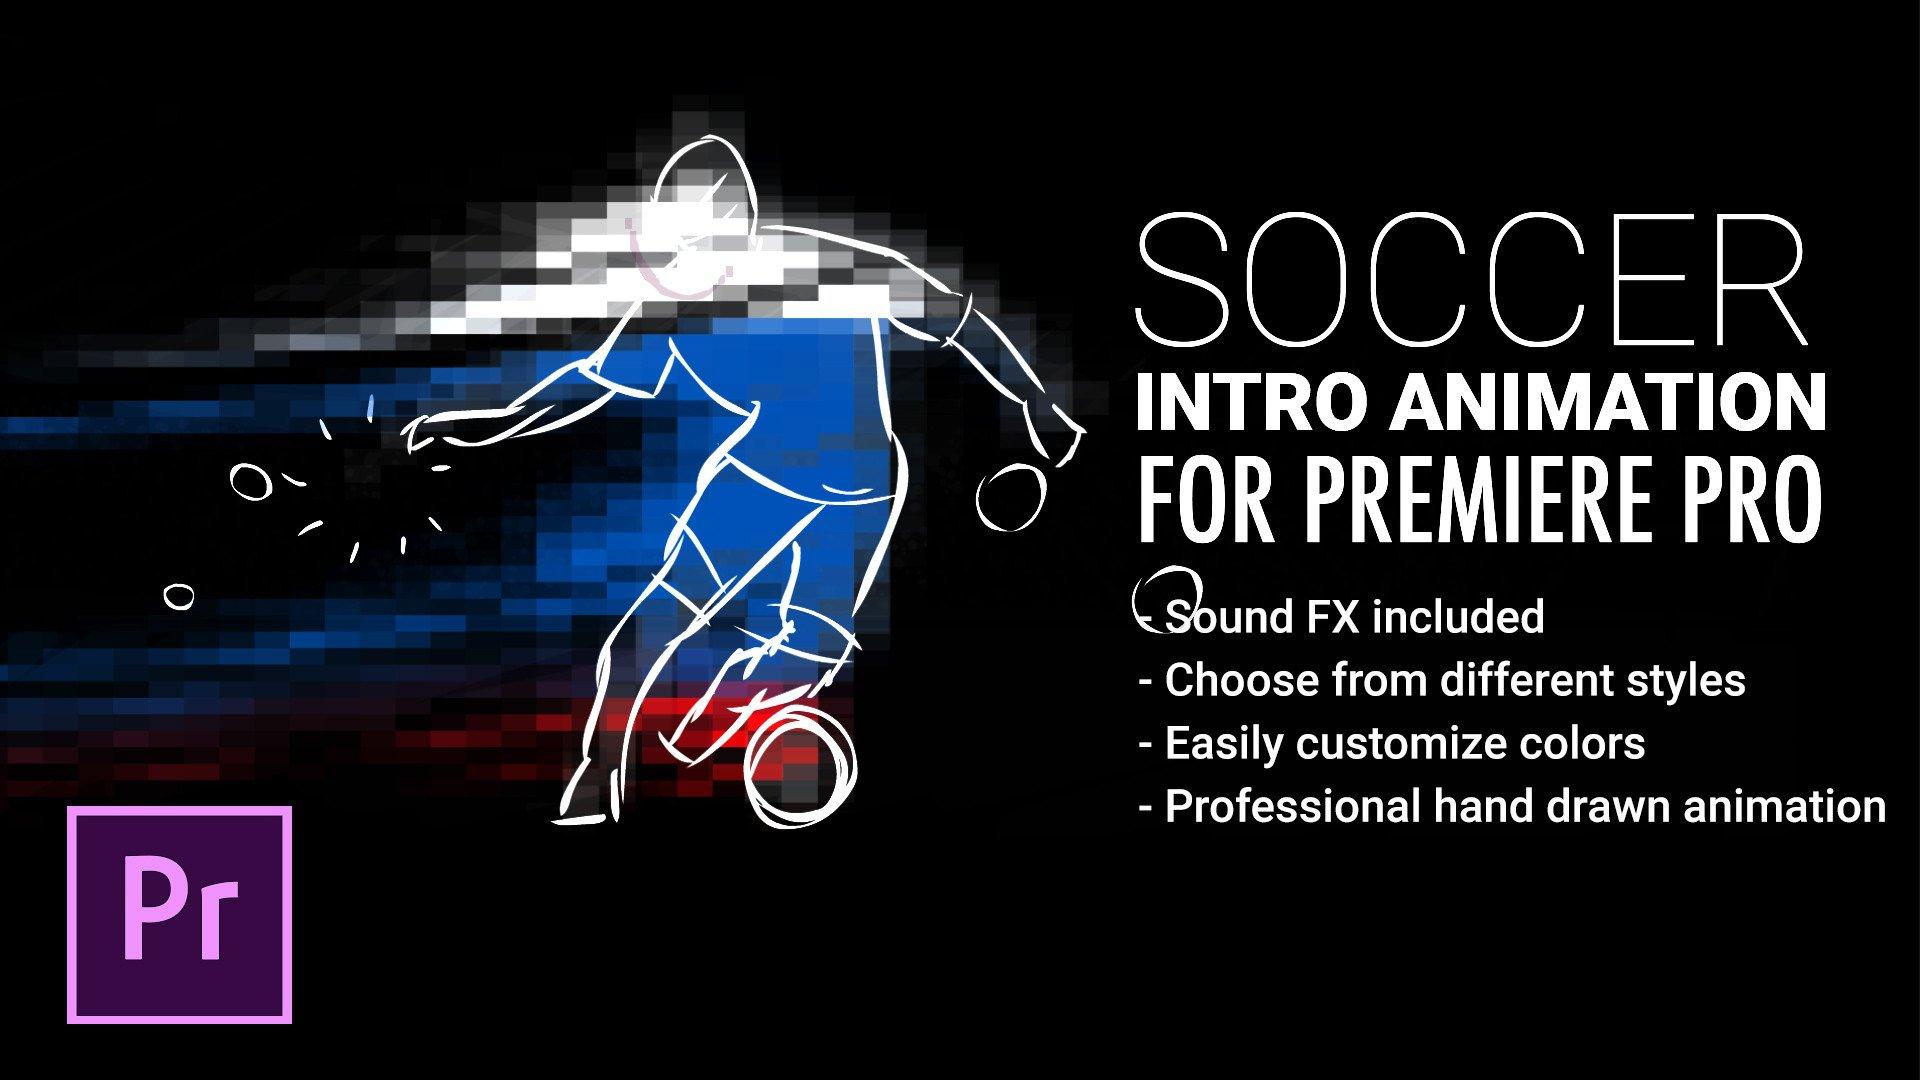 Adobe Premiere Intro Templates soccer Intro Animation for Premiere Pro by Snowcake